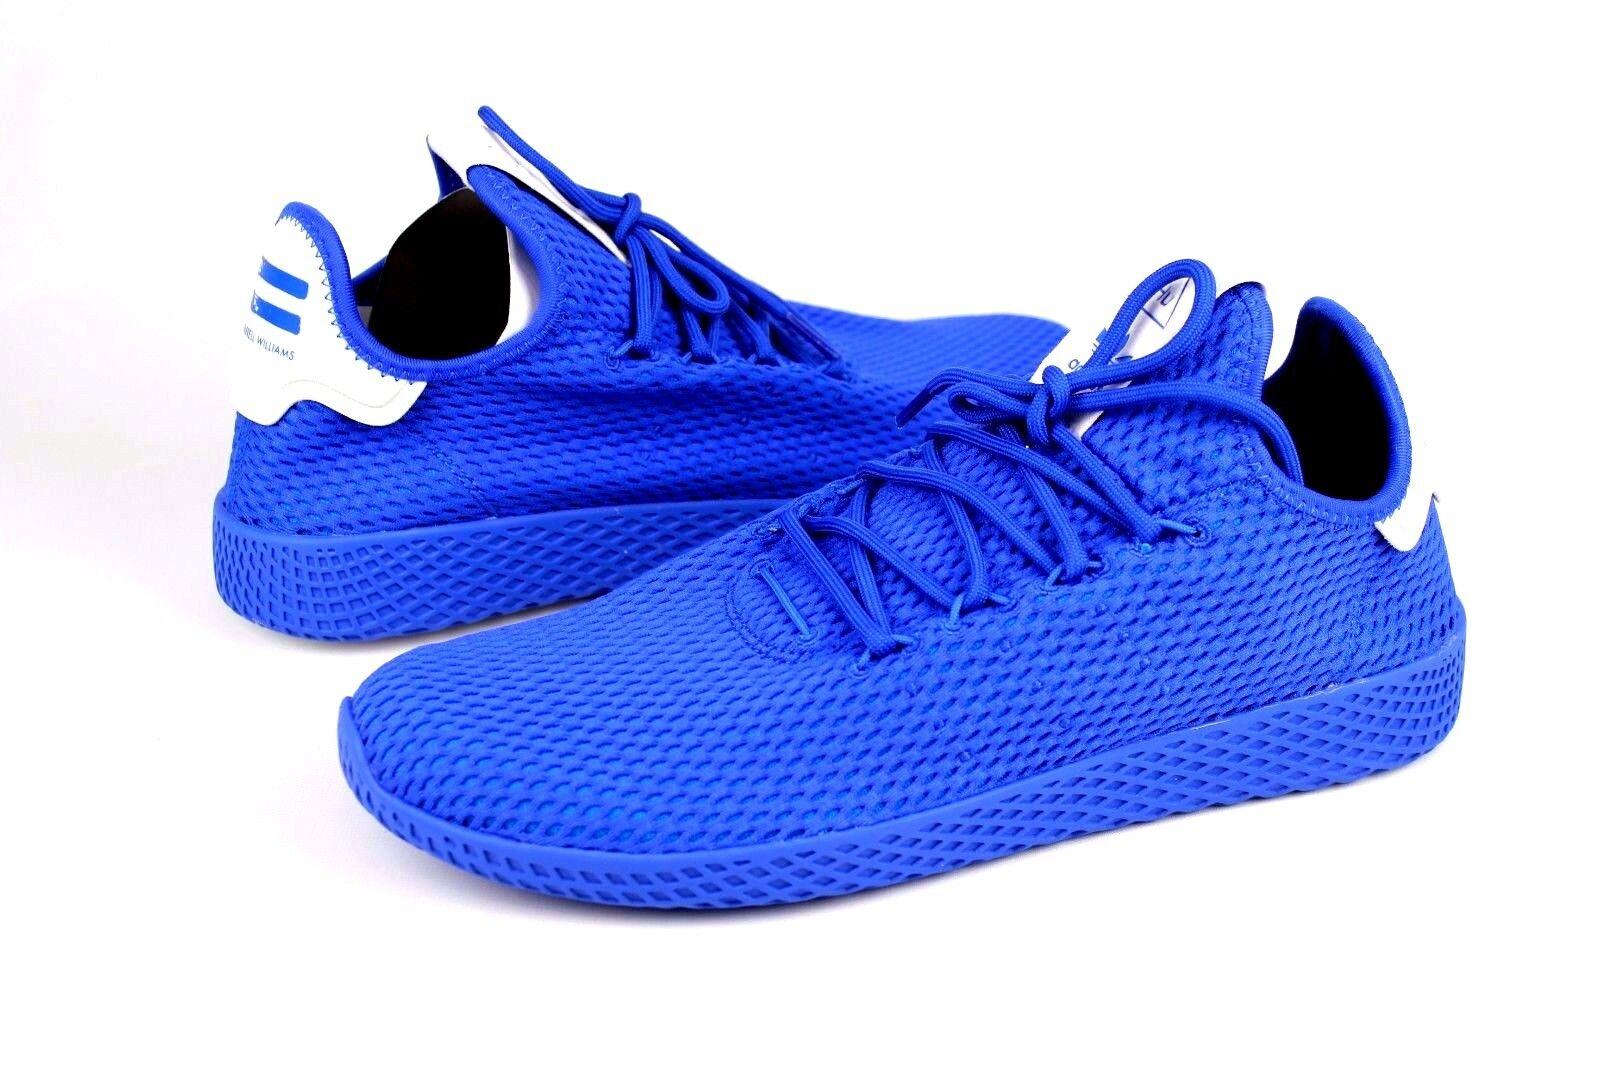 Adidas mens pharrell williams pw tennis hu menschliche rasse blaue mens Adidas größe 9 uns nib fc52a5